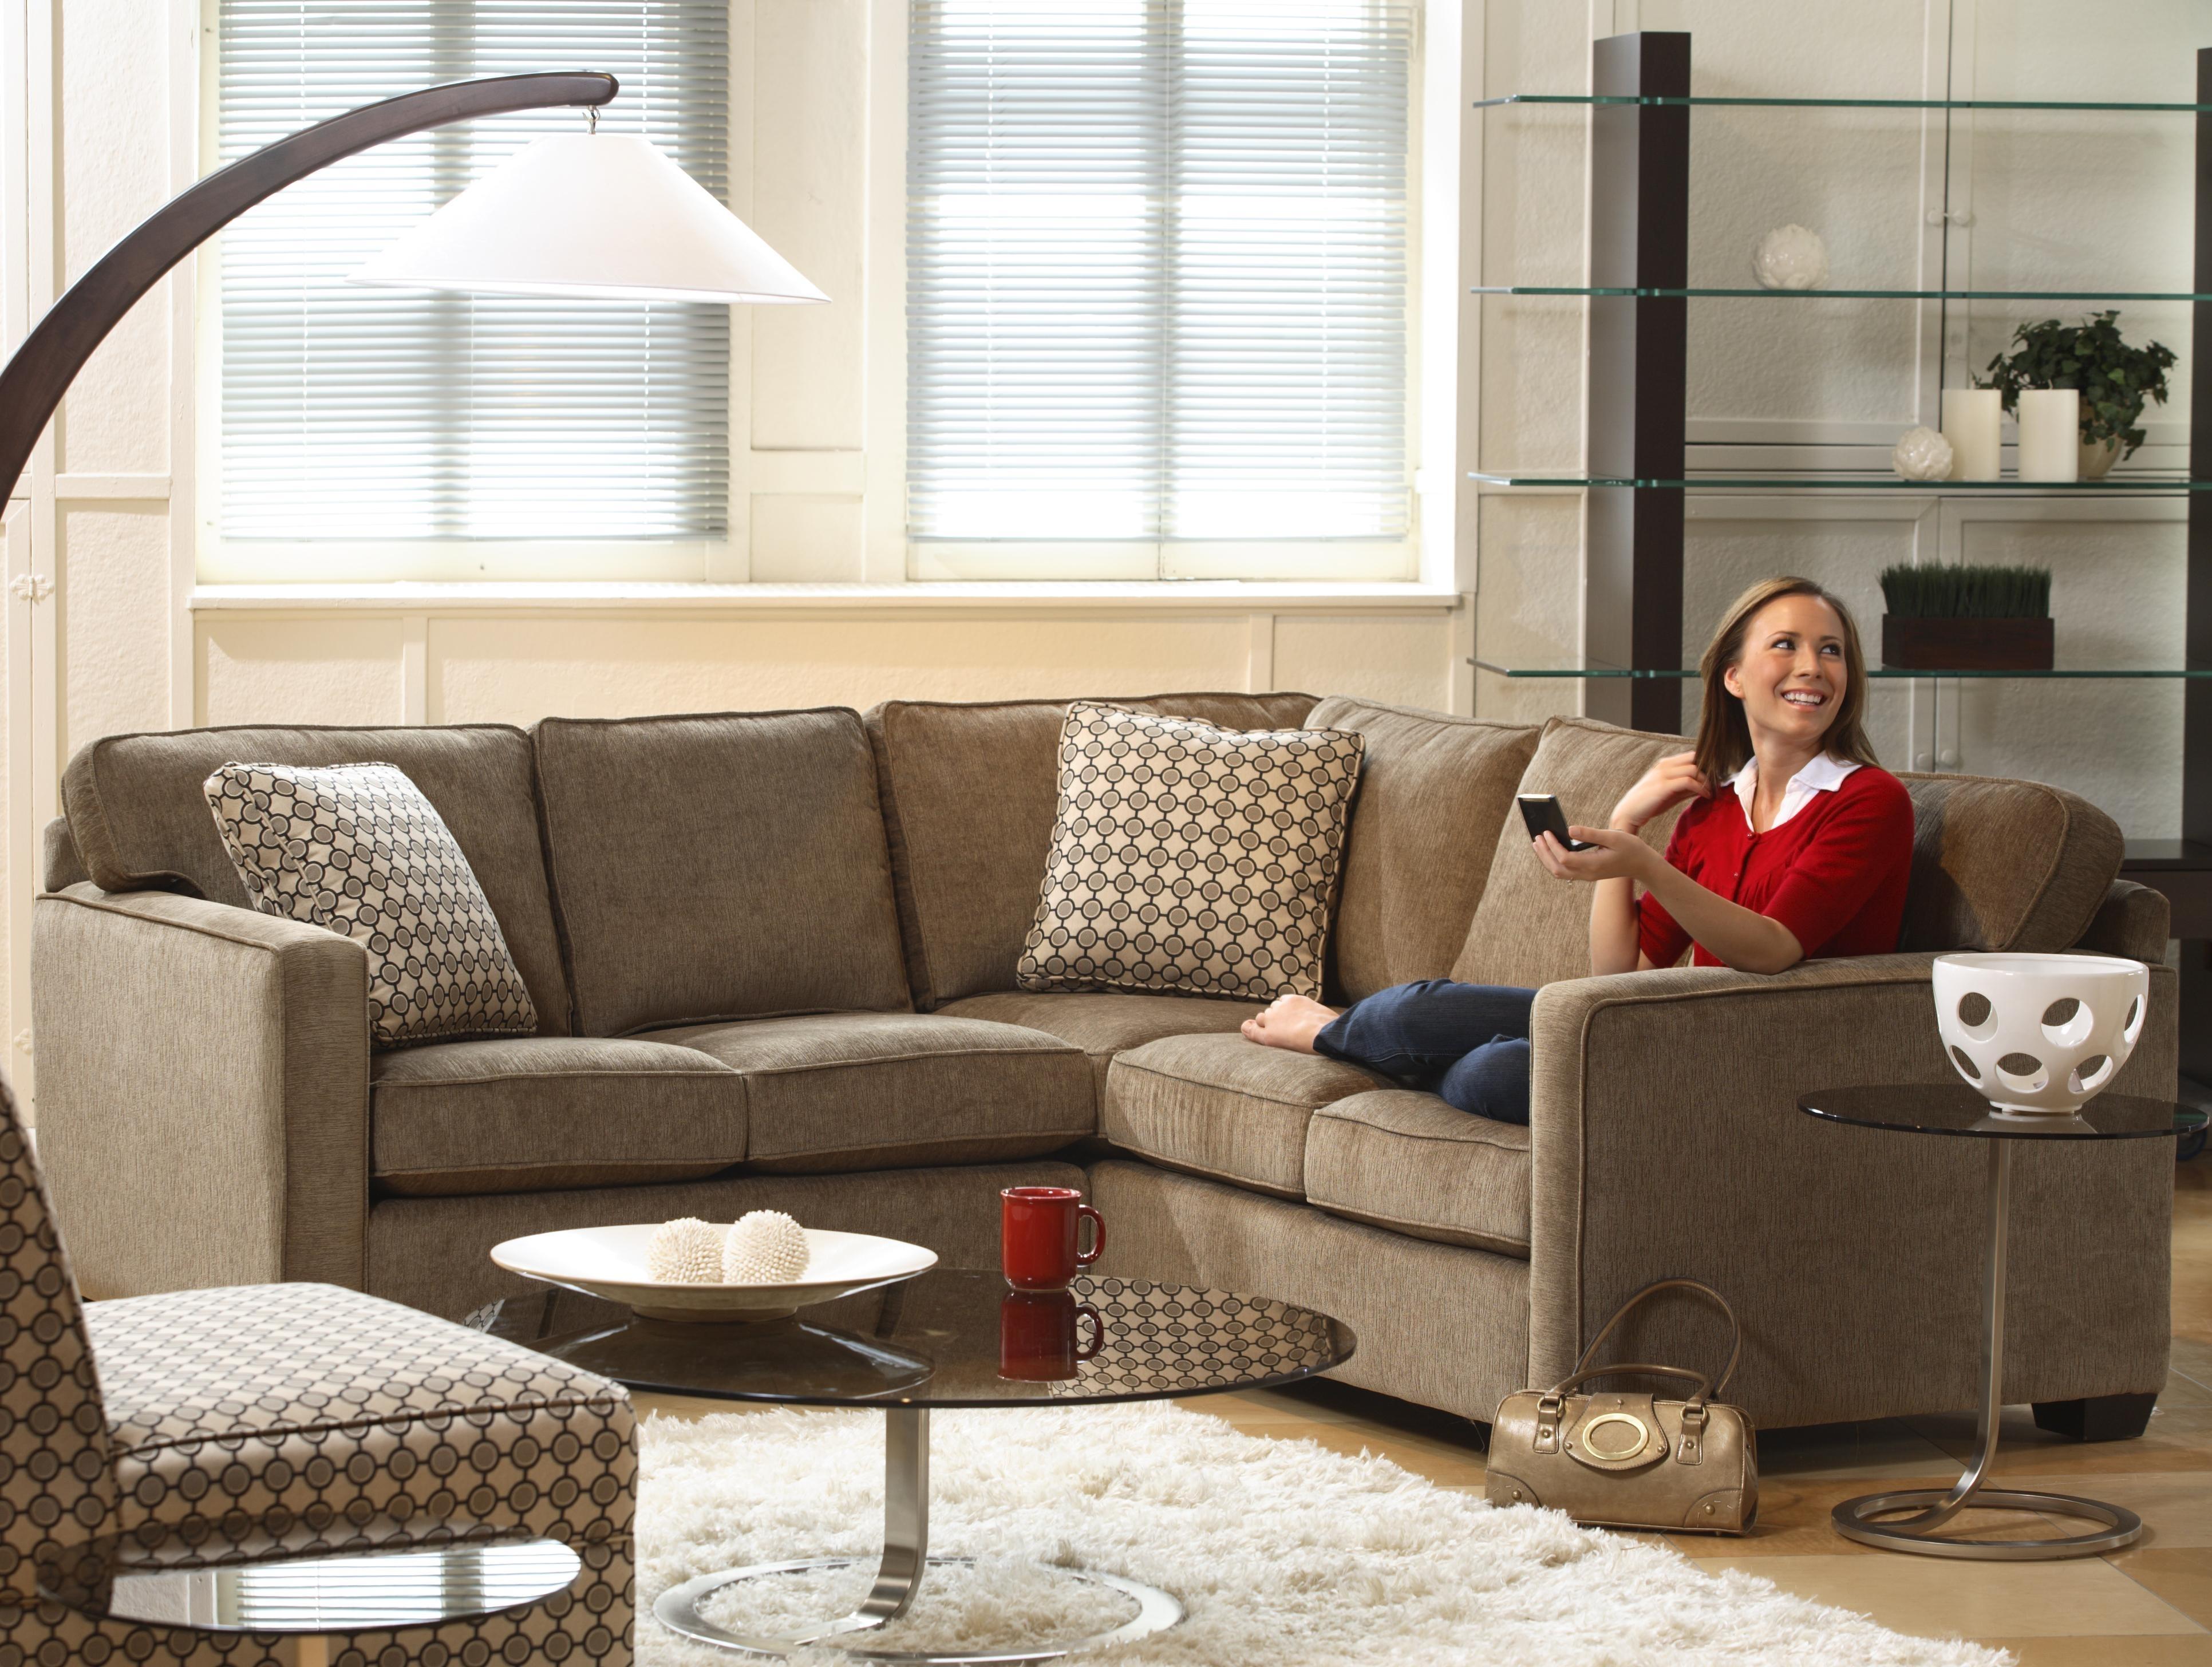 Lyric Five Seat Sectional Sofastylus | Housing | Pinterest with regard to Ontario Sectional Sofas (Image 6 of 10)